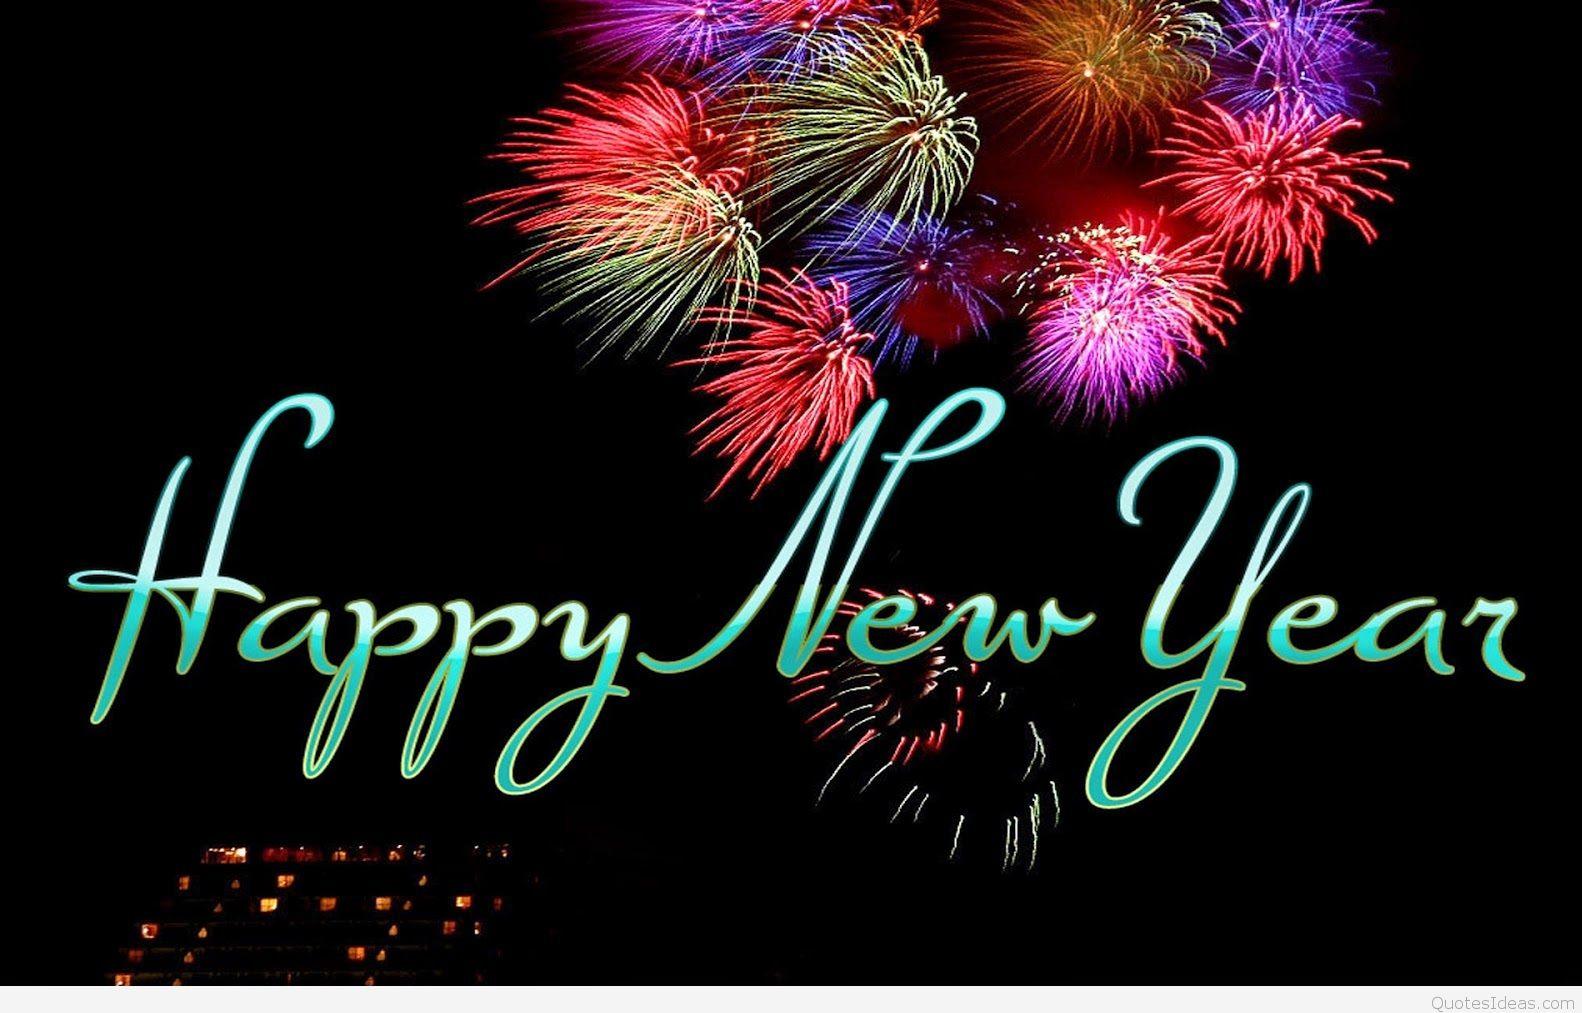 Happy-new-year-2016-photo-wallpaper-hd